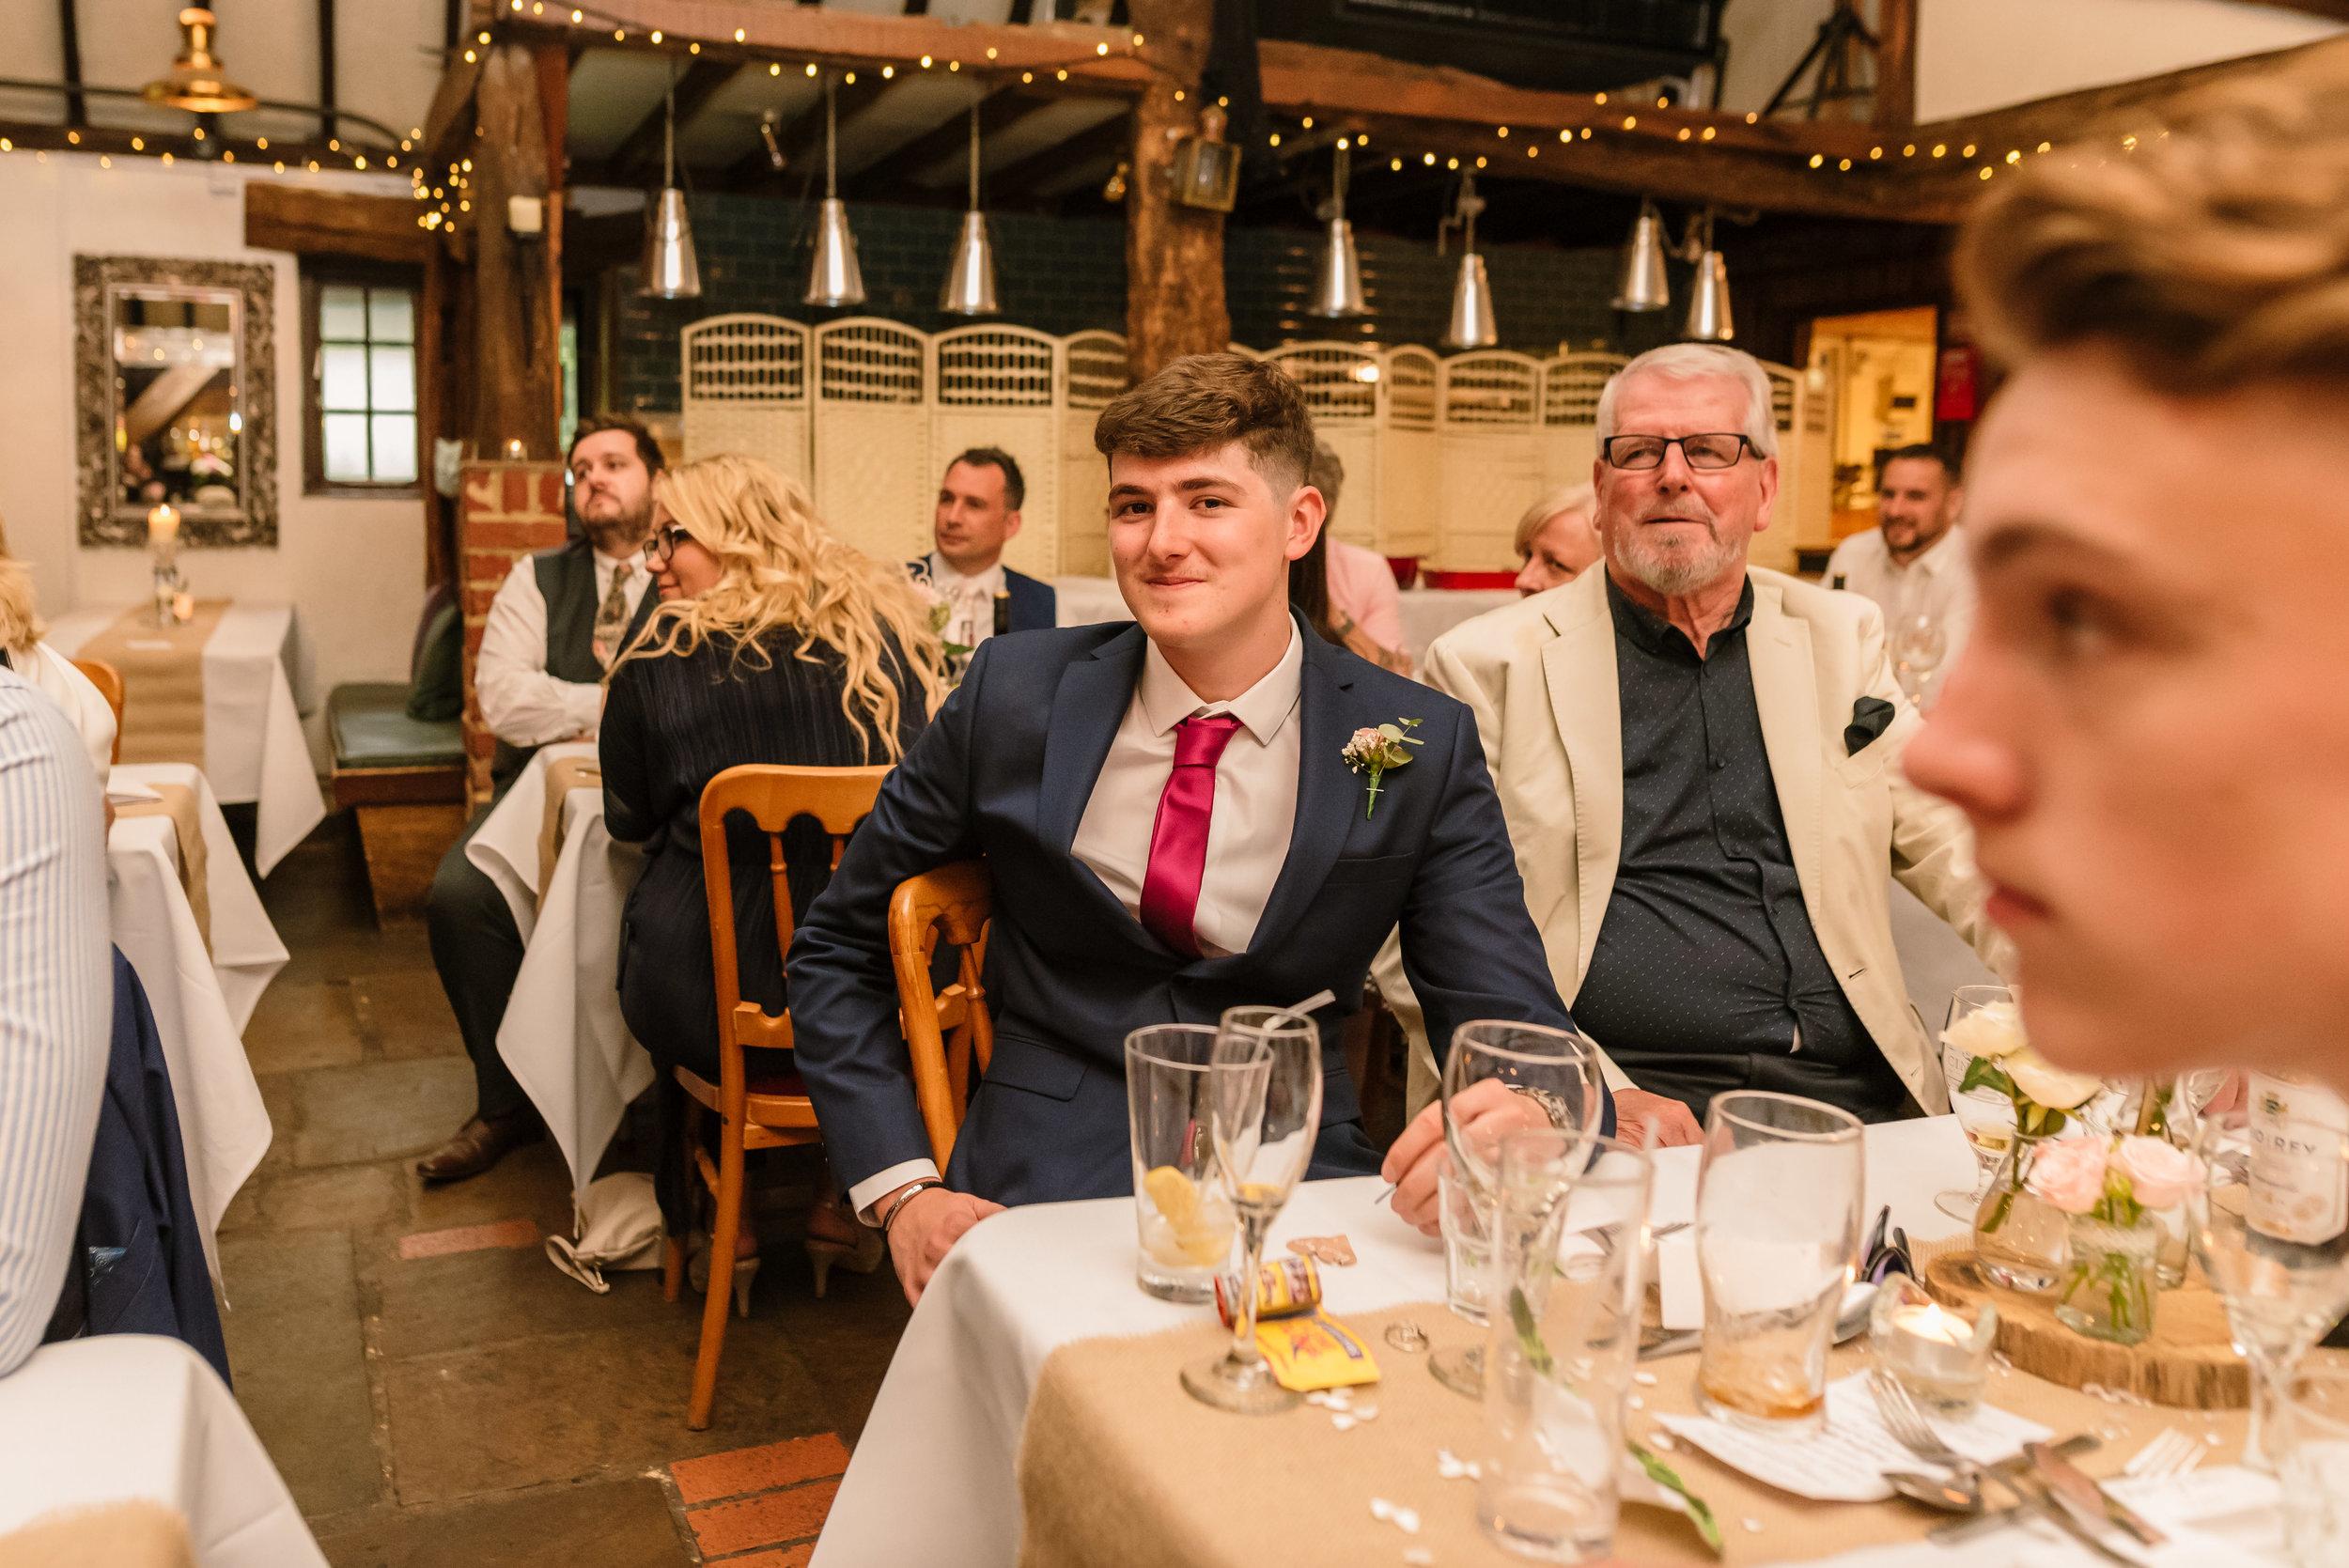 Sarah-Fishlock-Photography : Hampshire-wedding-photographer-hampshire : fleet-wedding-photographer-fleet : Meade-Hall-Wedding-Photographer : Meade-Hall-Wedding-Photos-818.jpg